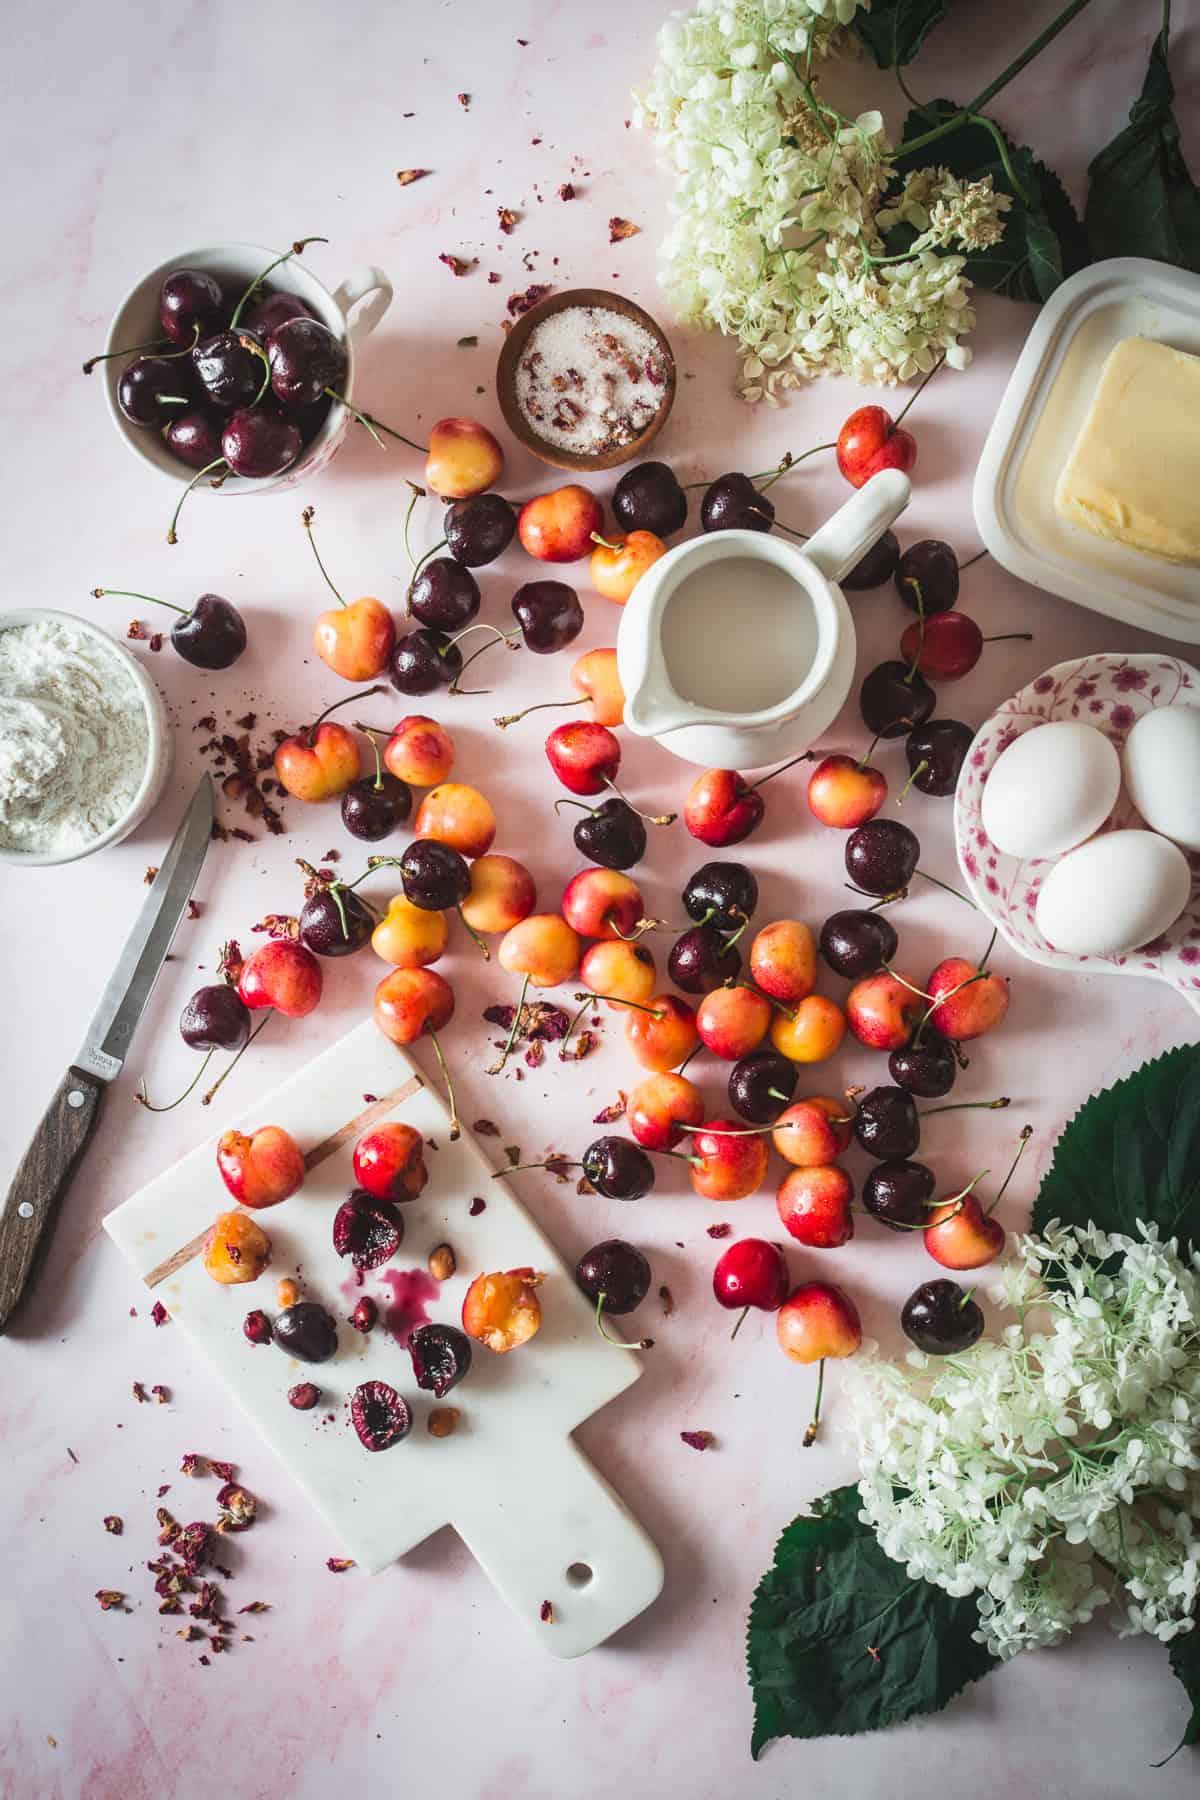 cherries and ingredients